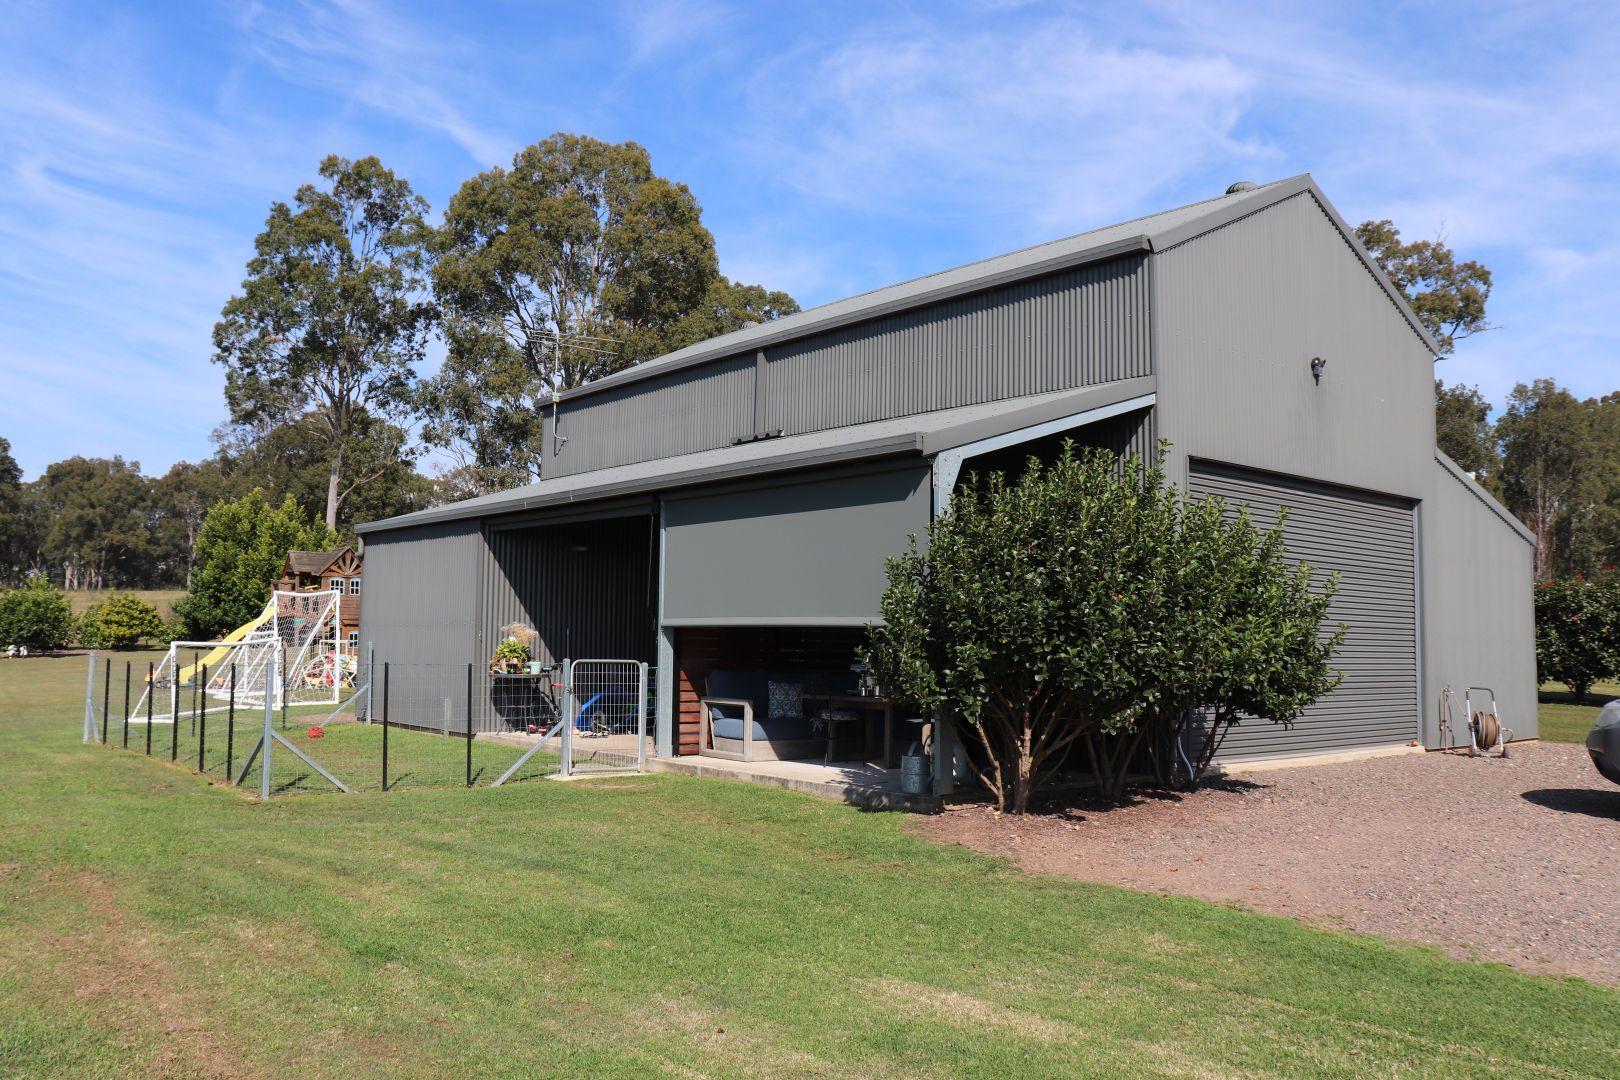 16 Sophia Jane Drive, Nelsons Plains NSW 2324